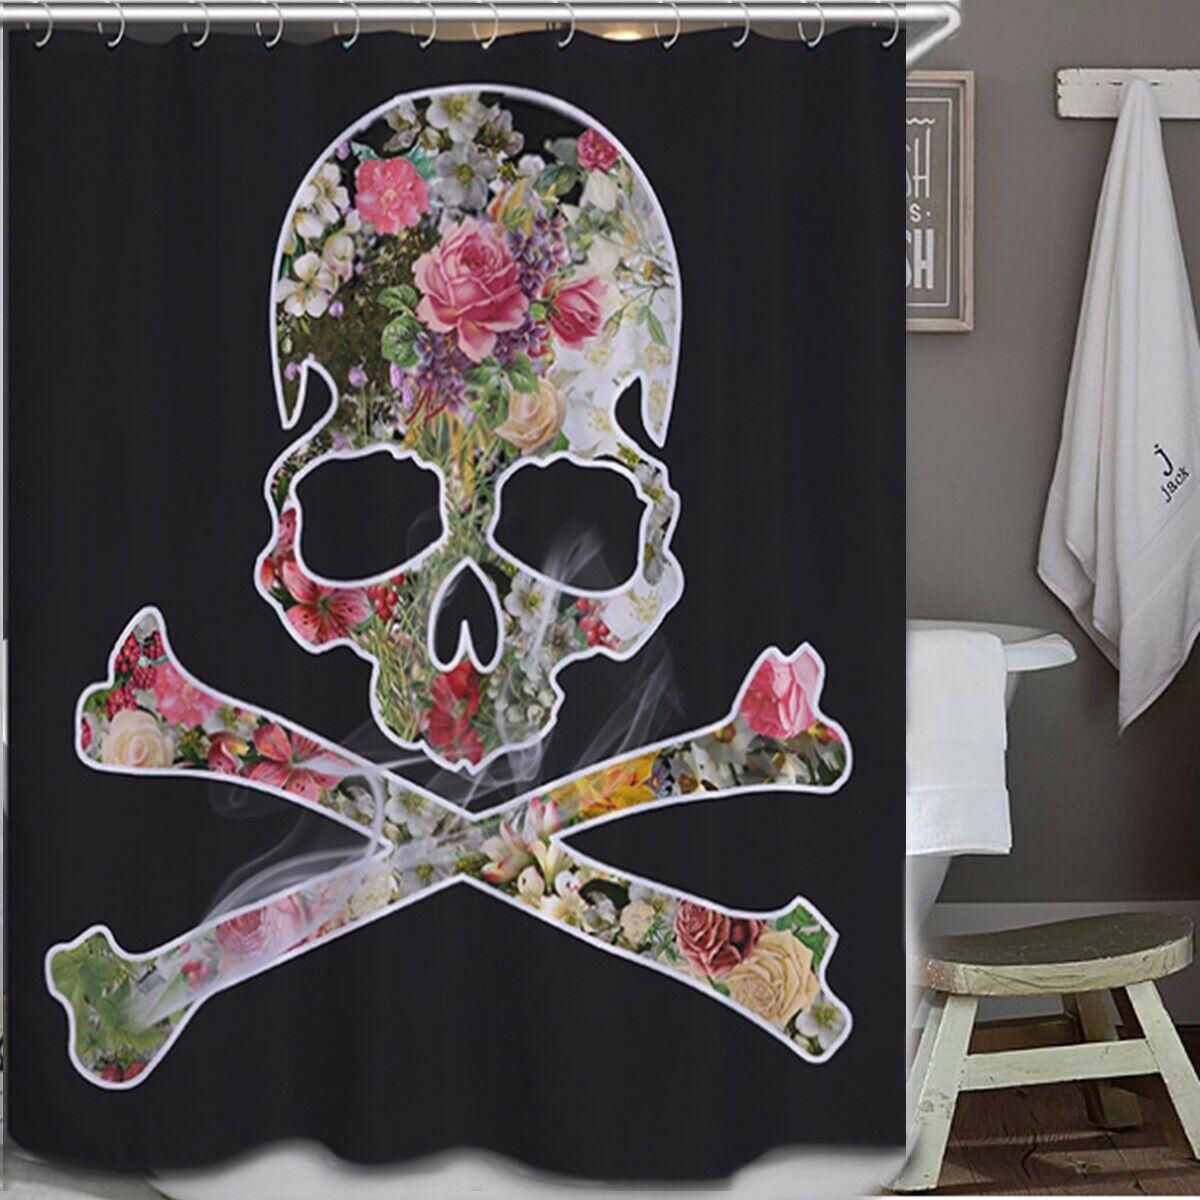 Waterproof Skull Cross Bones Shaped Flowers Bathroom Shower Curtain 12 Hooks